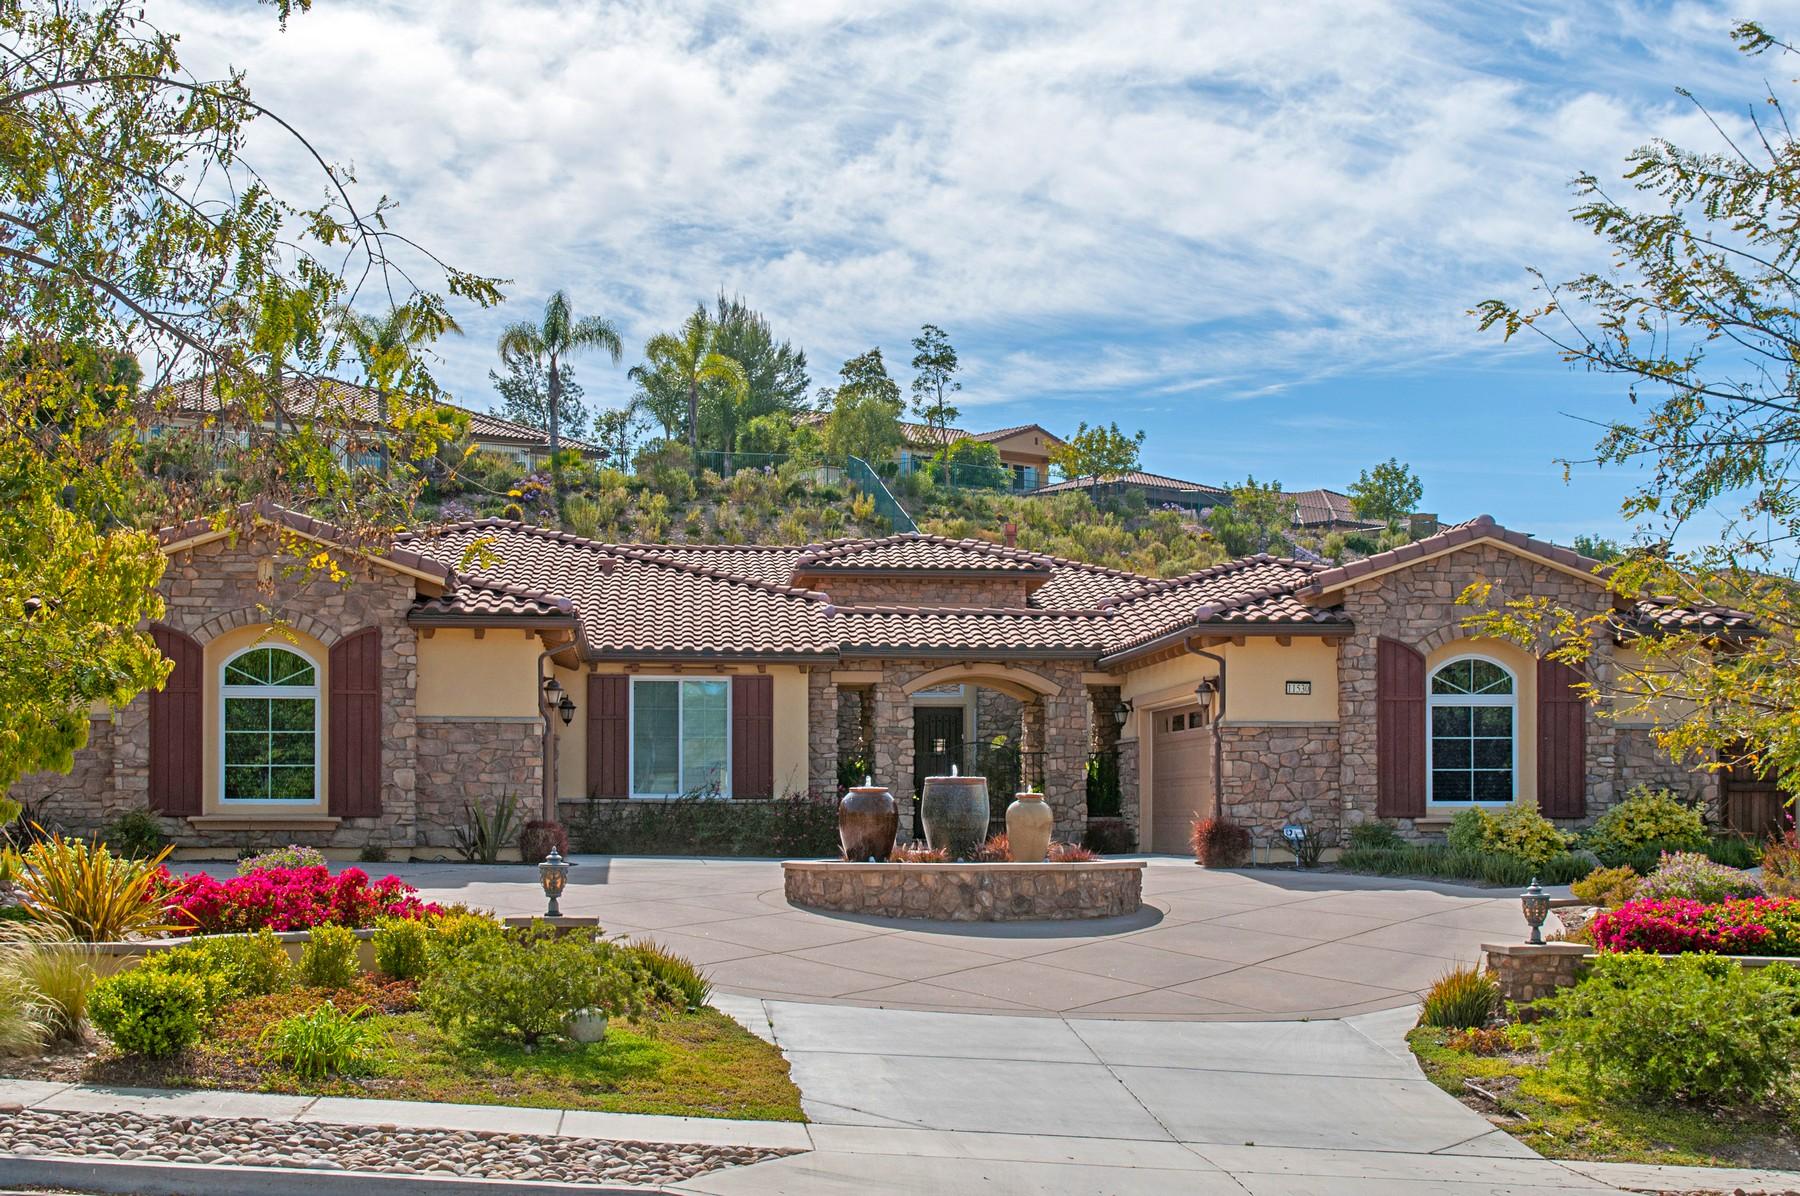 Single Family Home for Sale at 11530 Big Canyon 11530 Big Canyon Lane San Diego, California, 92131 United States